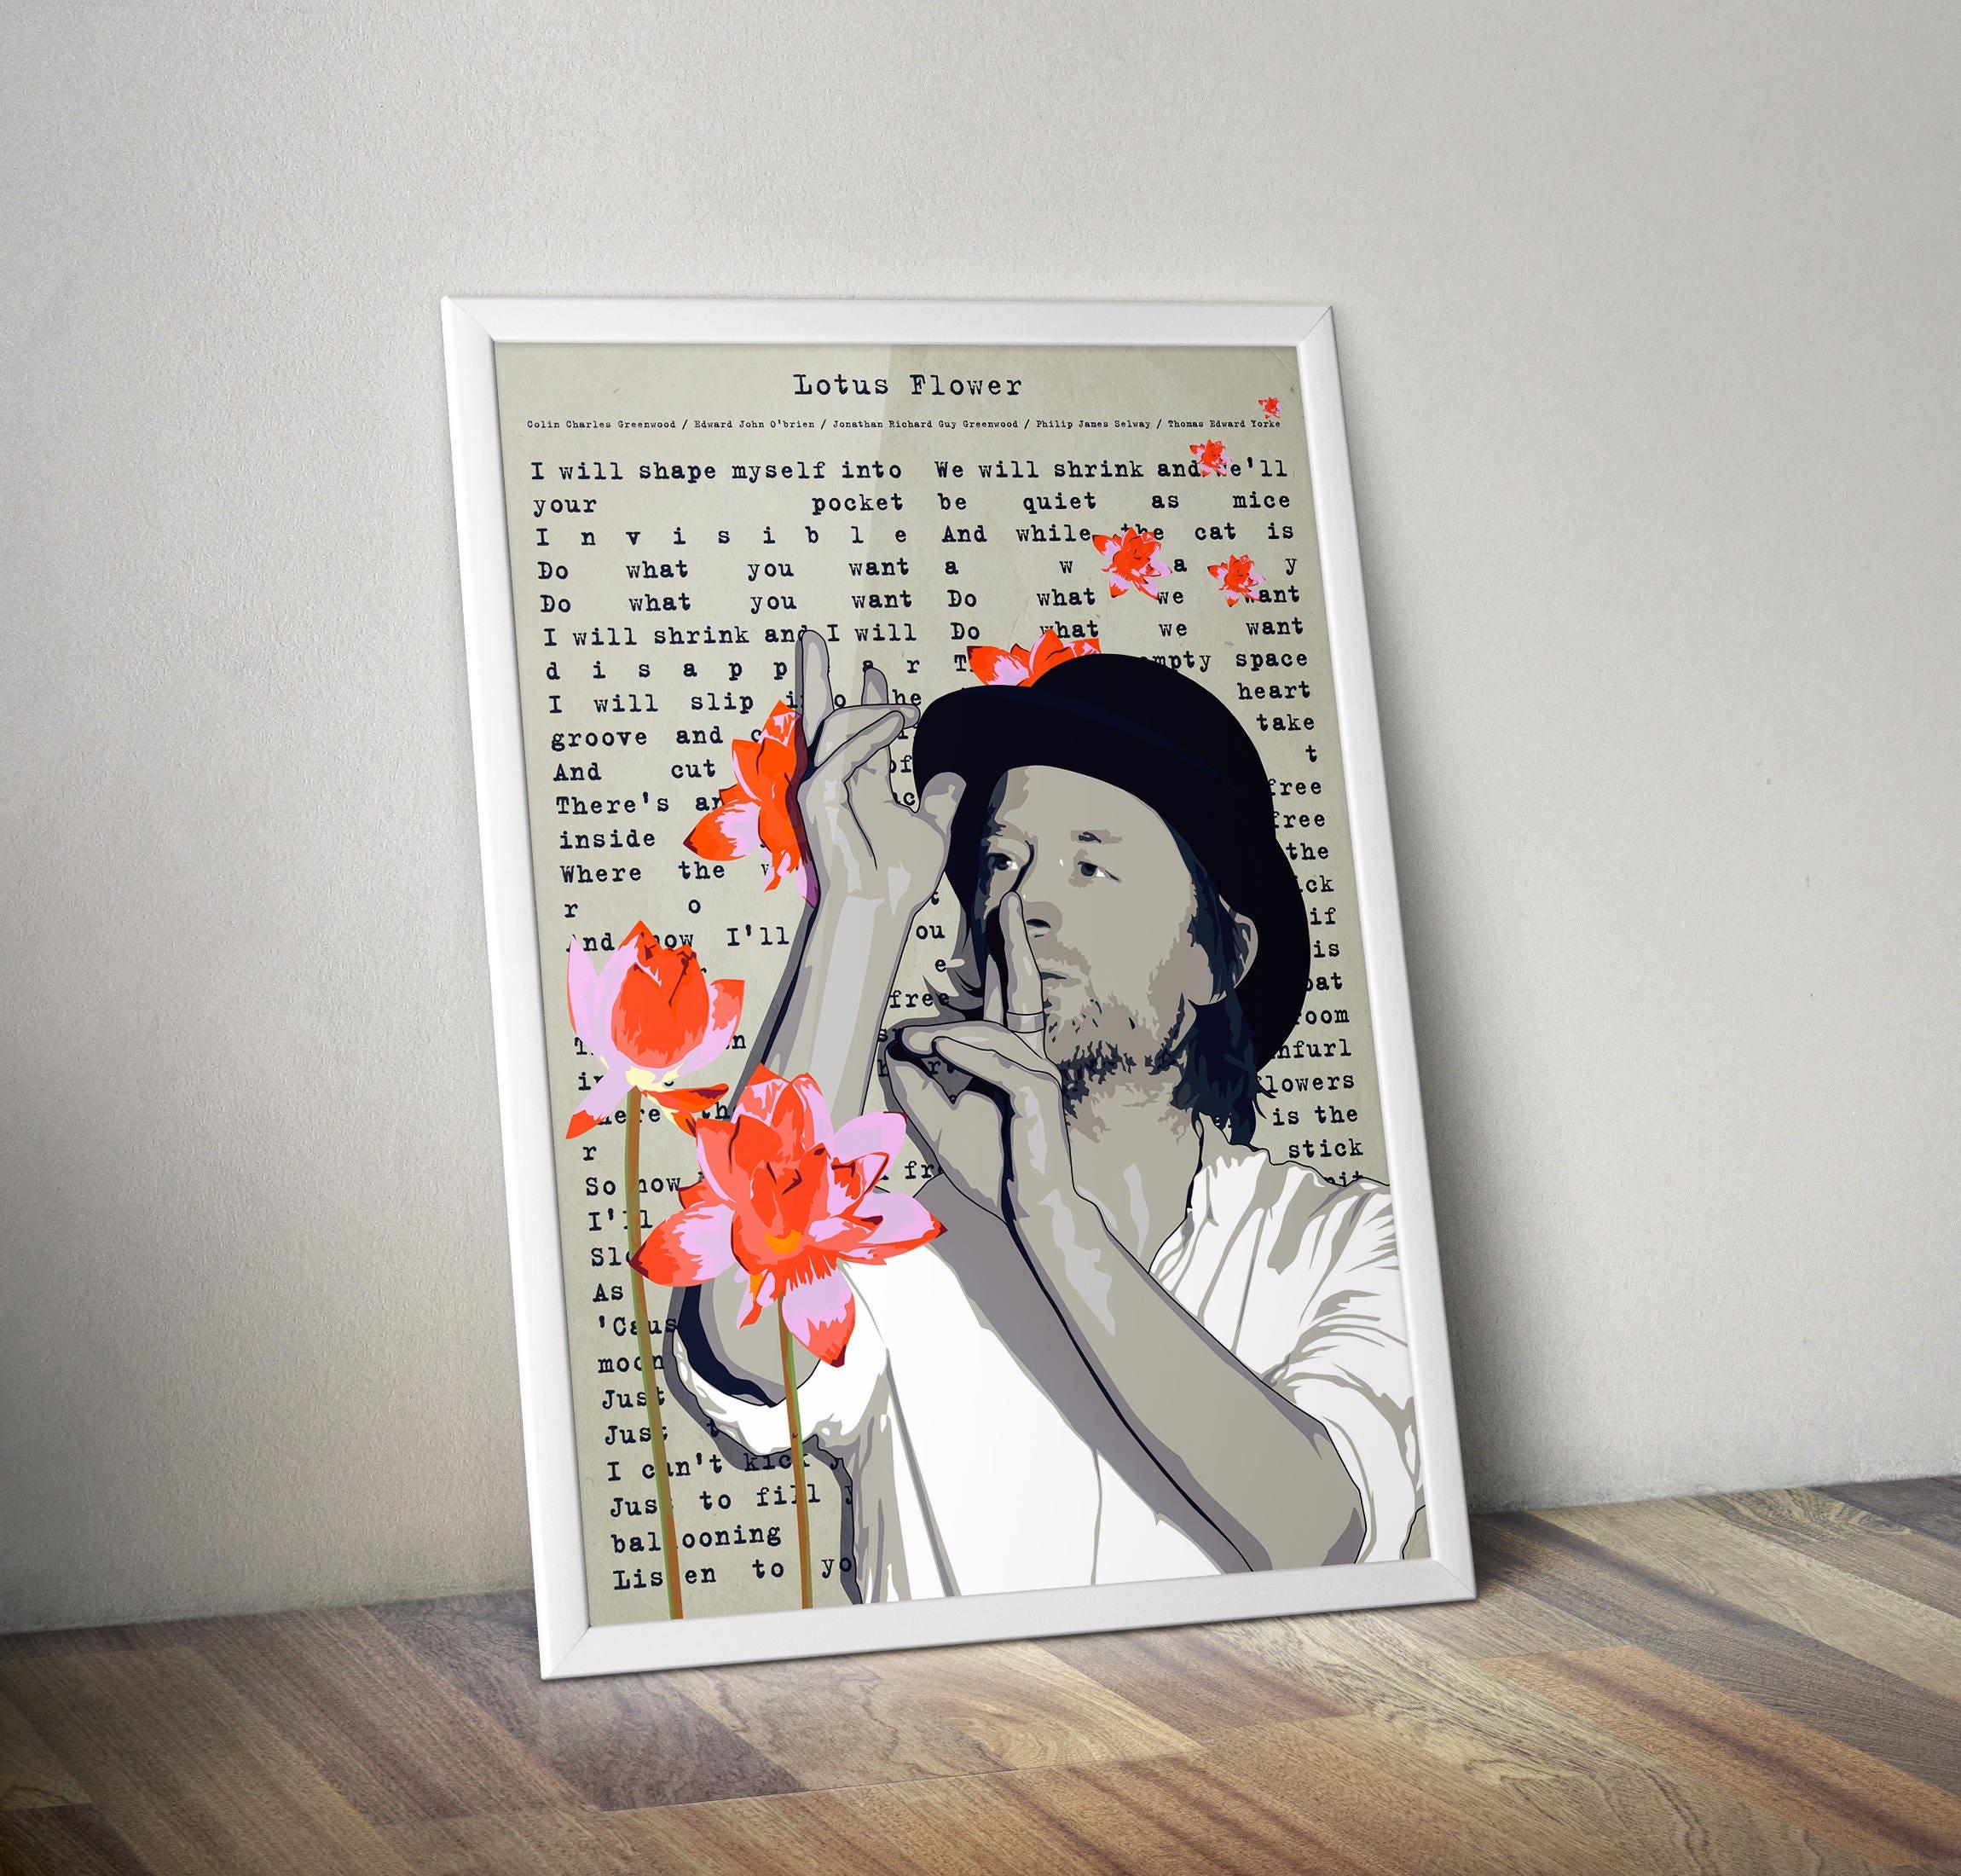 Thom Yorke Poster Radiohead Lotus Flower Jonny Greenwood In Etsy